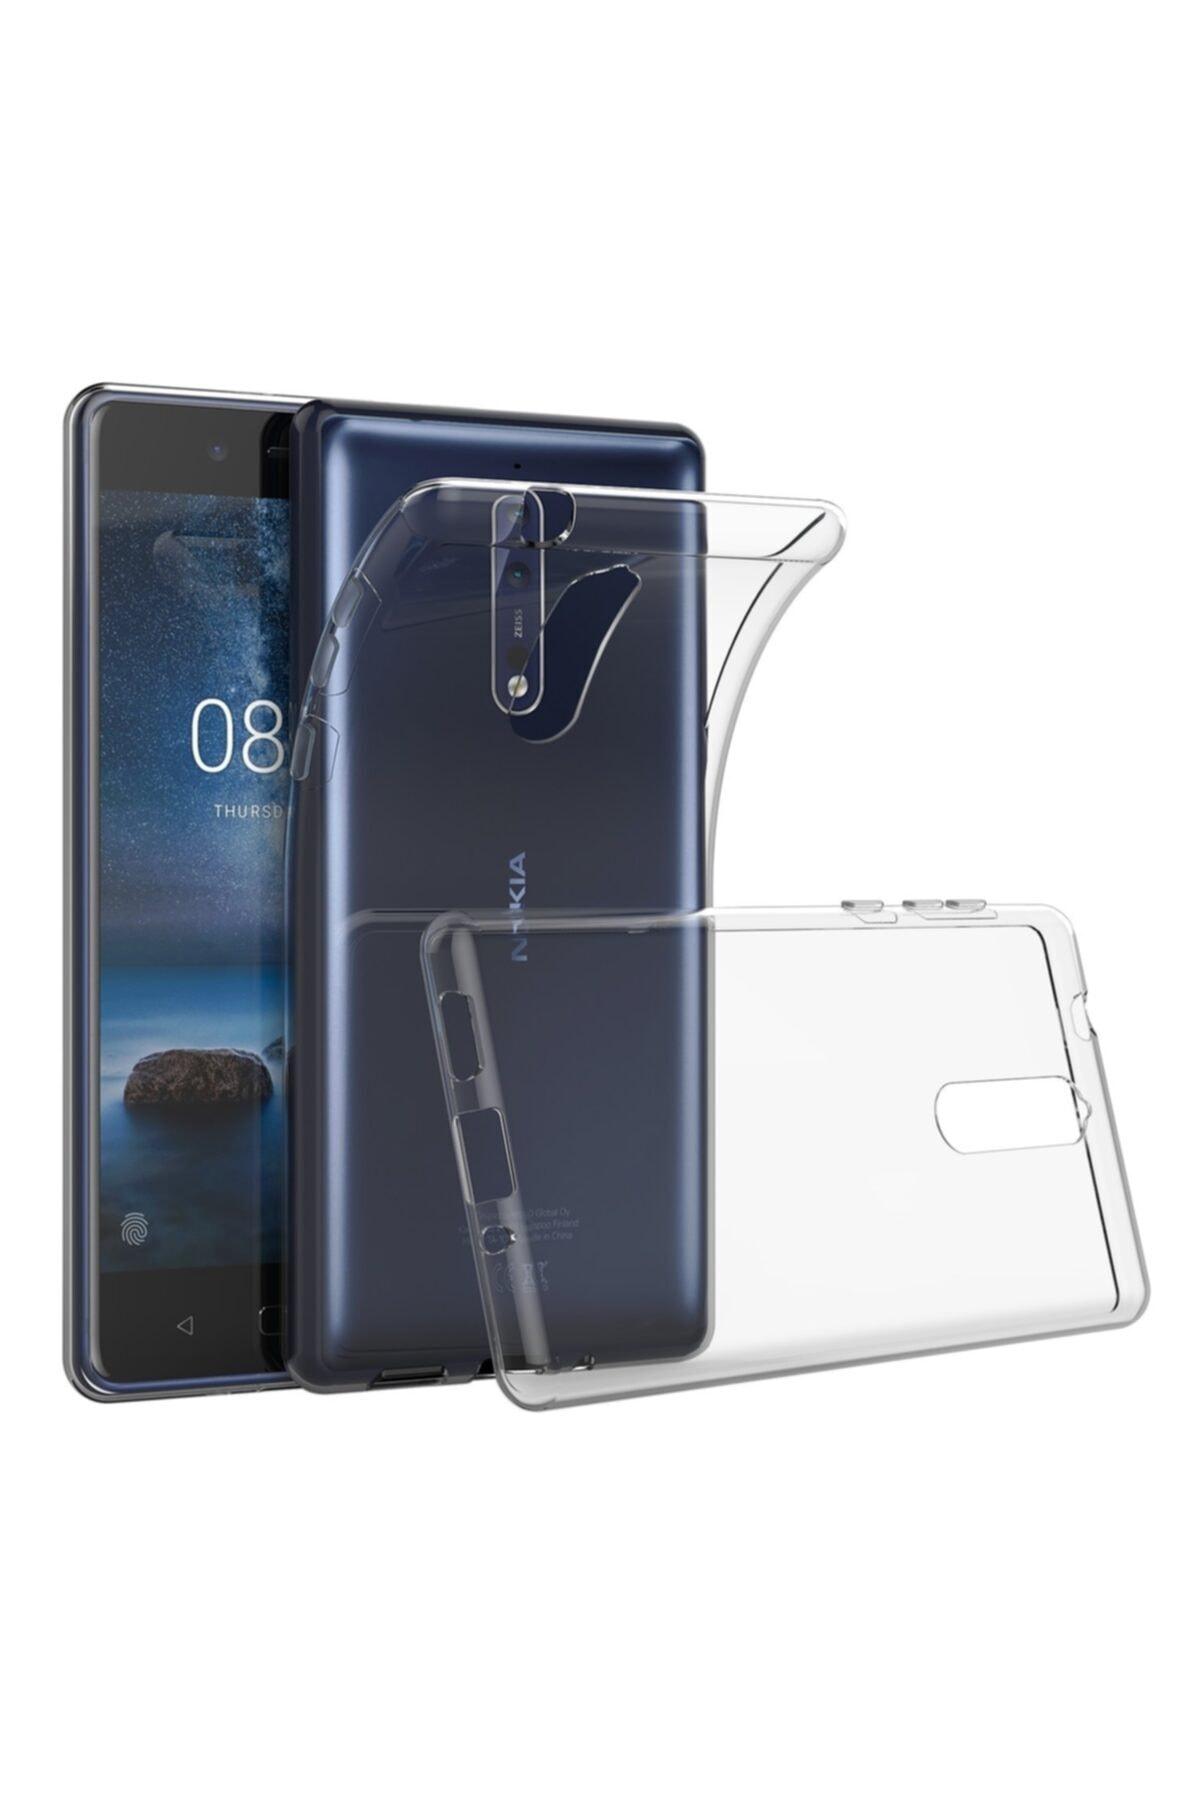 Nokia 8 Kılıf Soft Silikon Şeffaf Arka Kapak 1